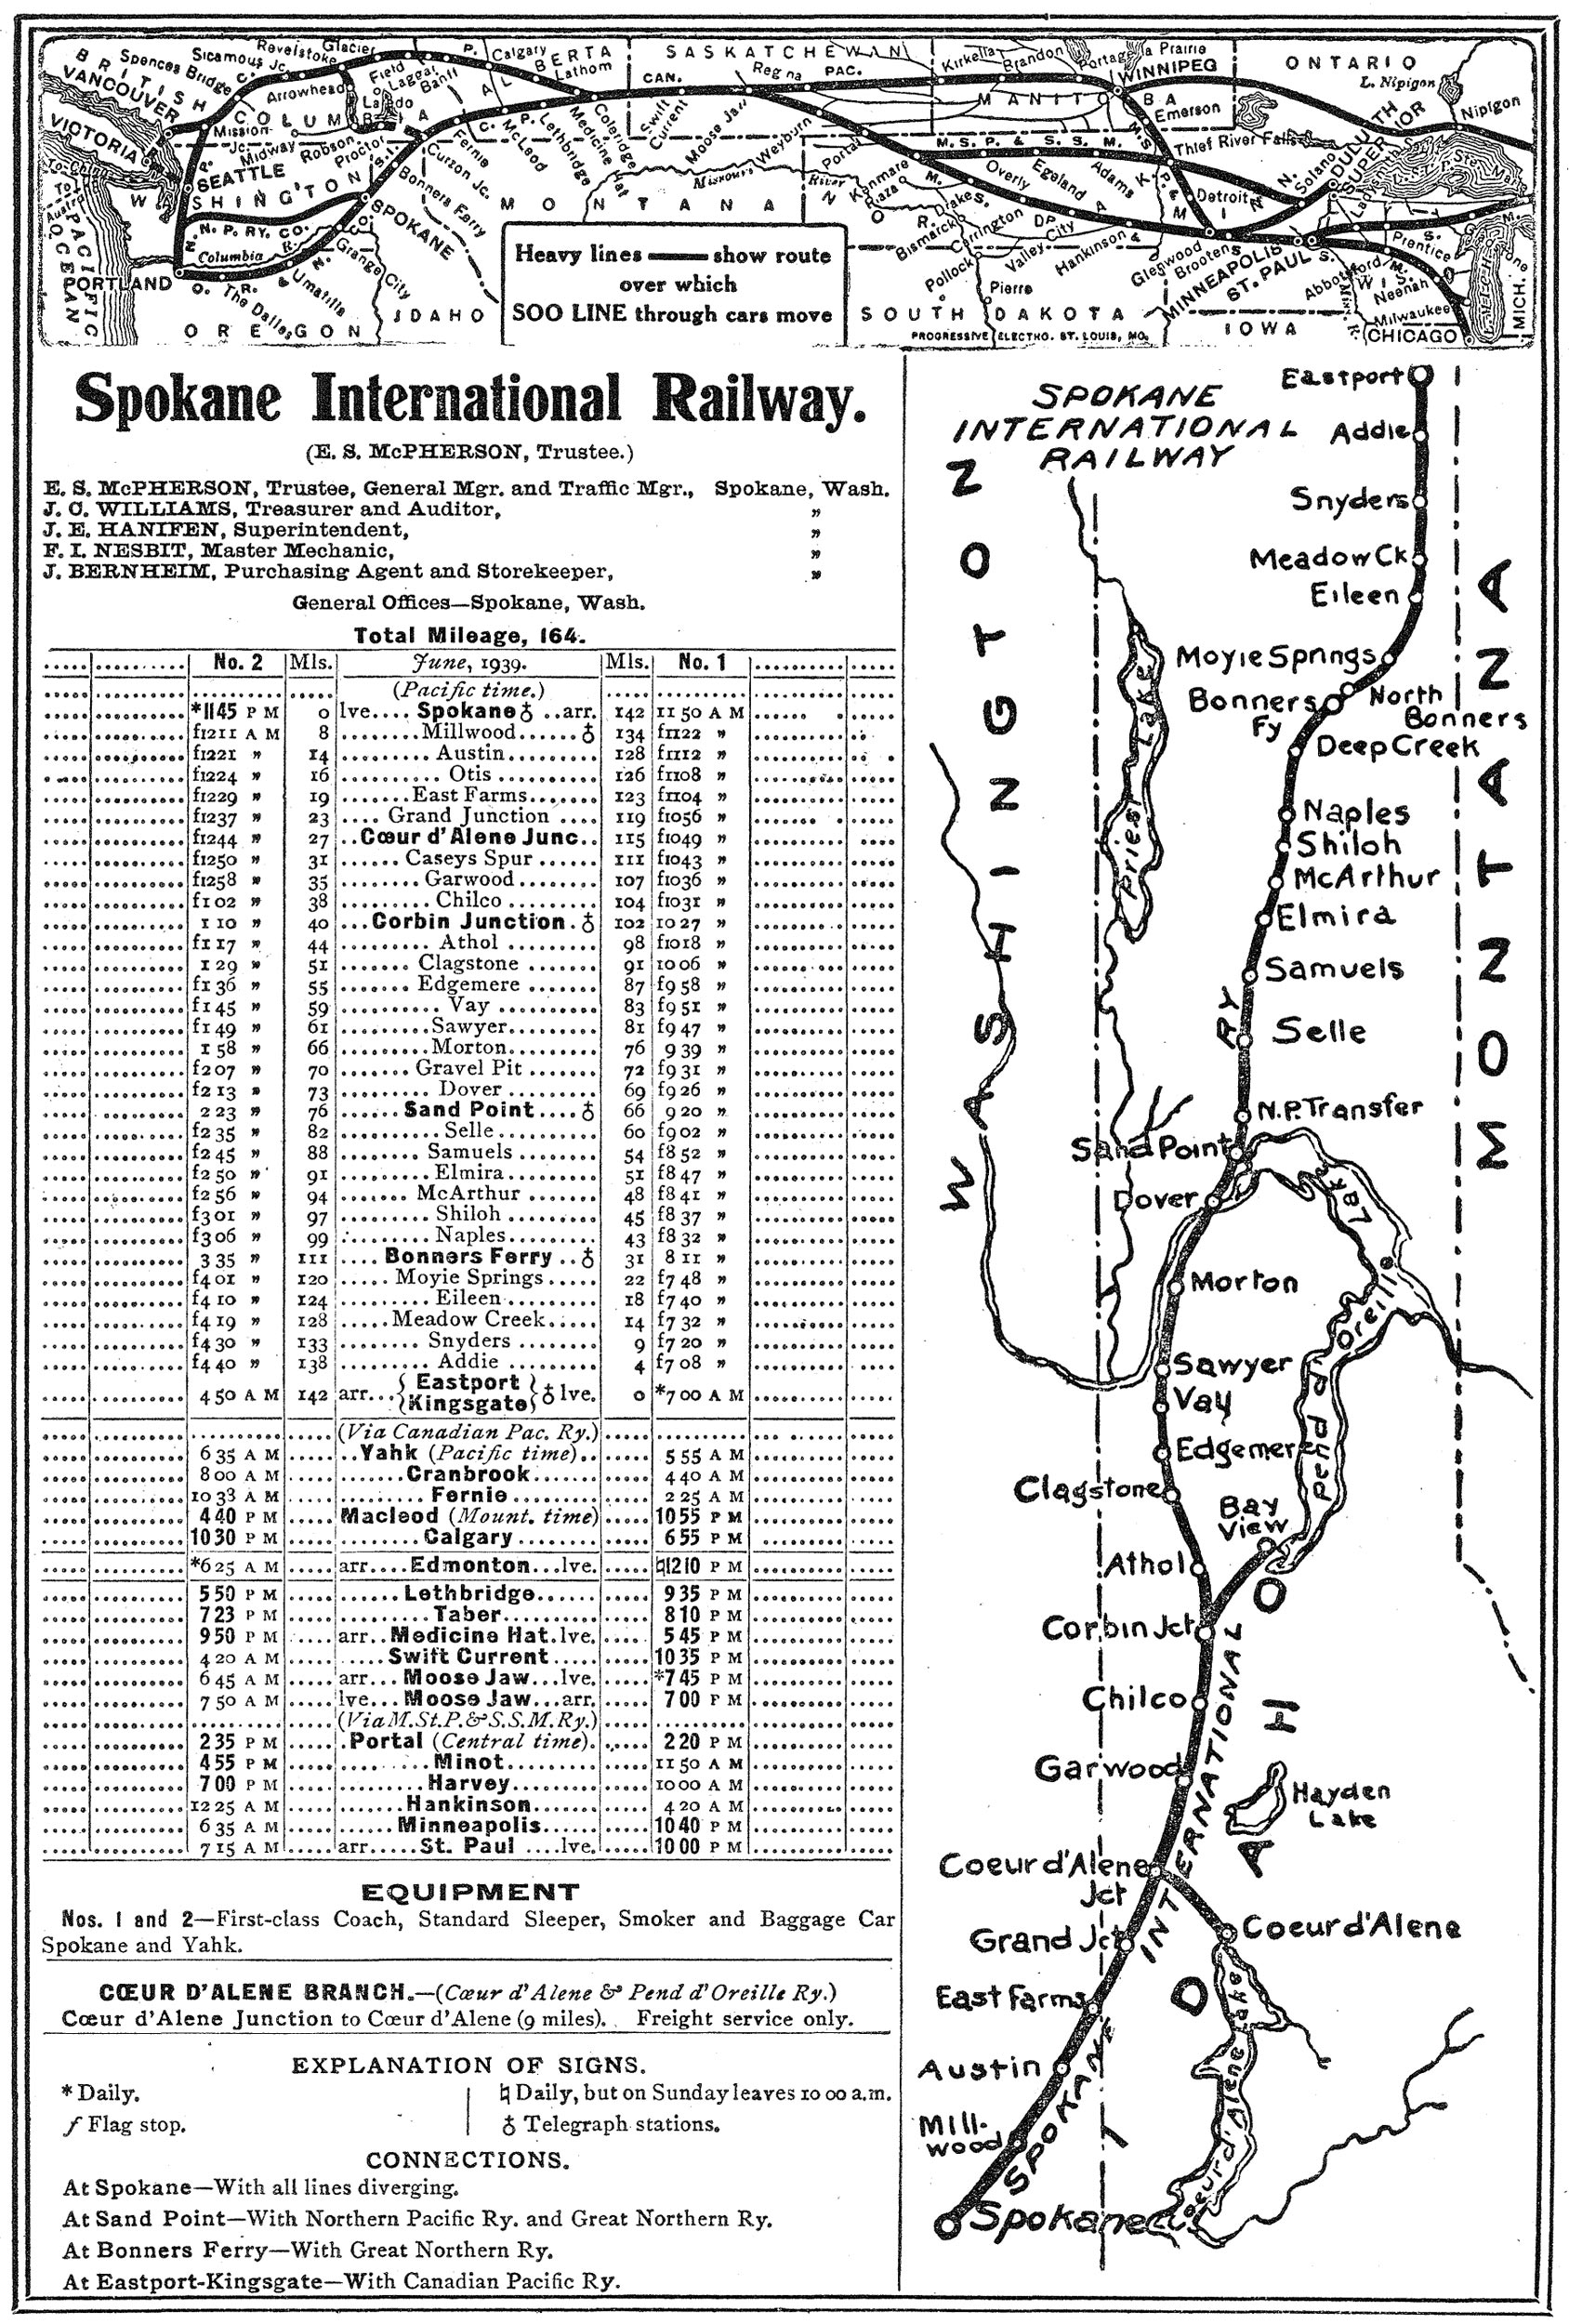 Spokane International Railroad on ma railroad map, gt railroad map, nys&w railroad map, sp railroad map,